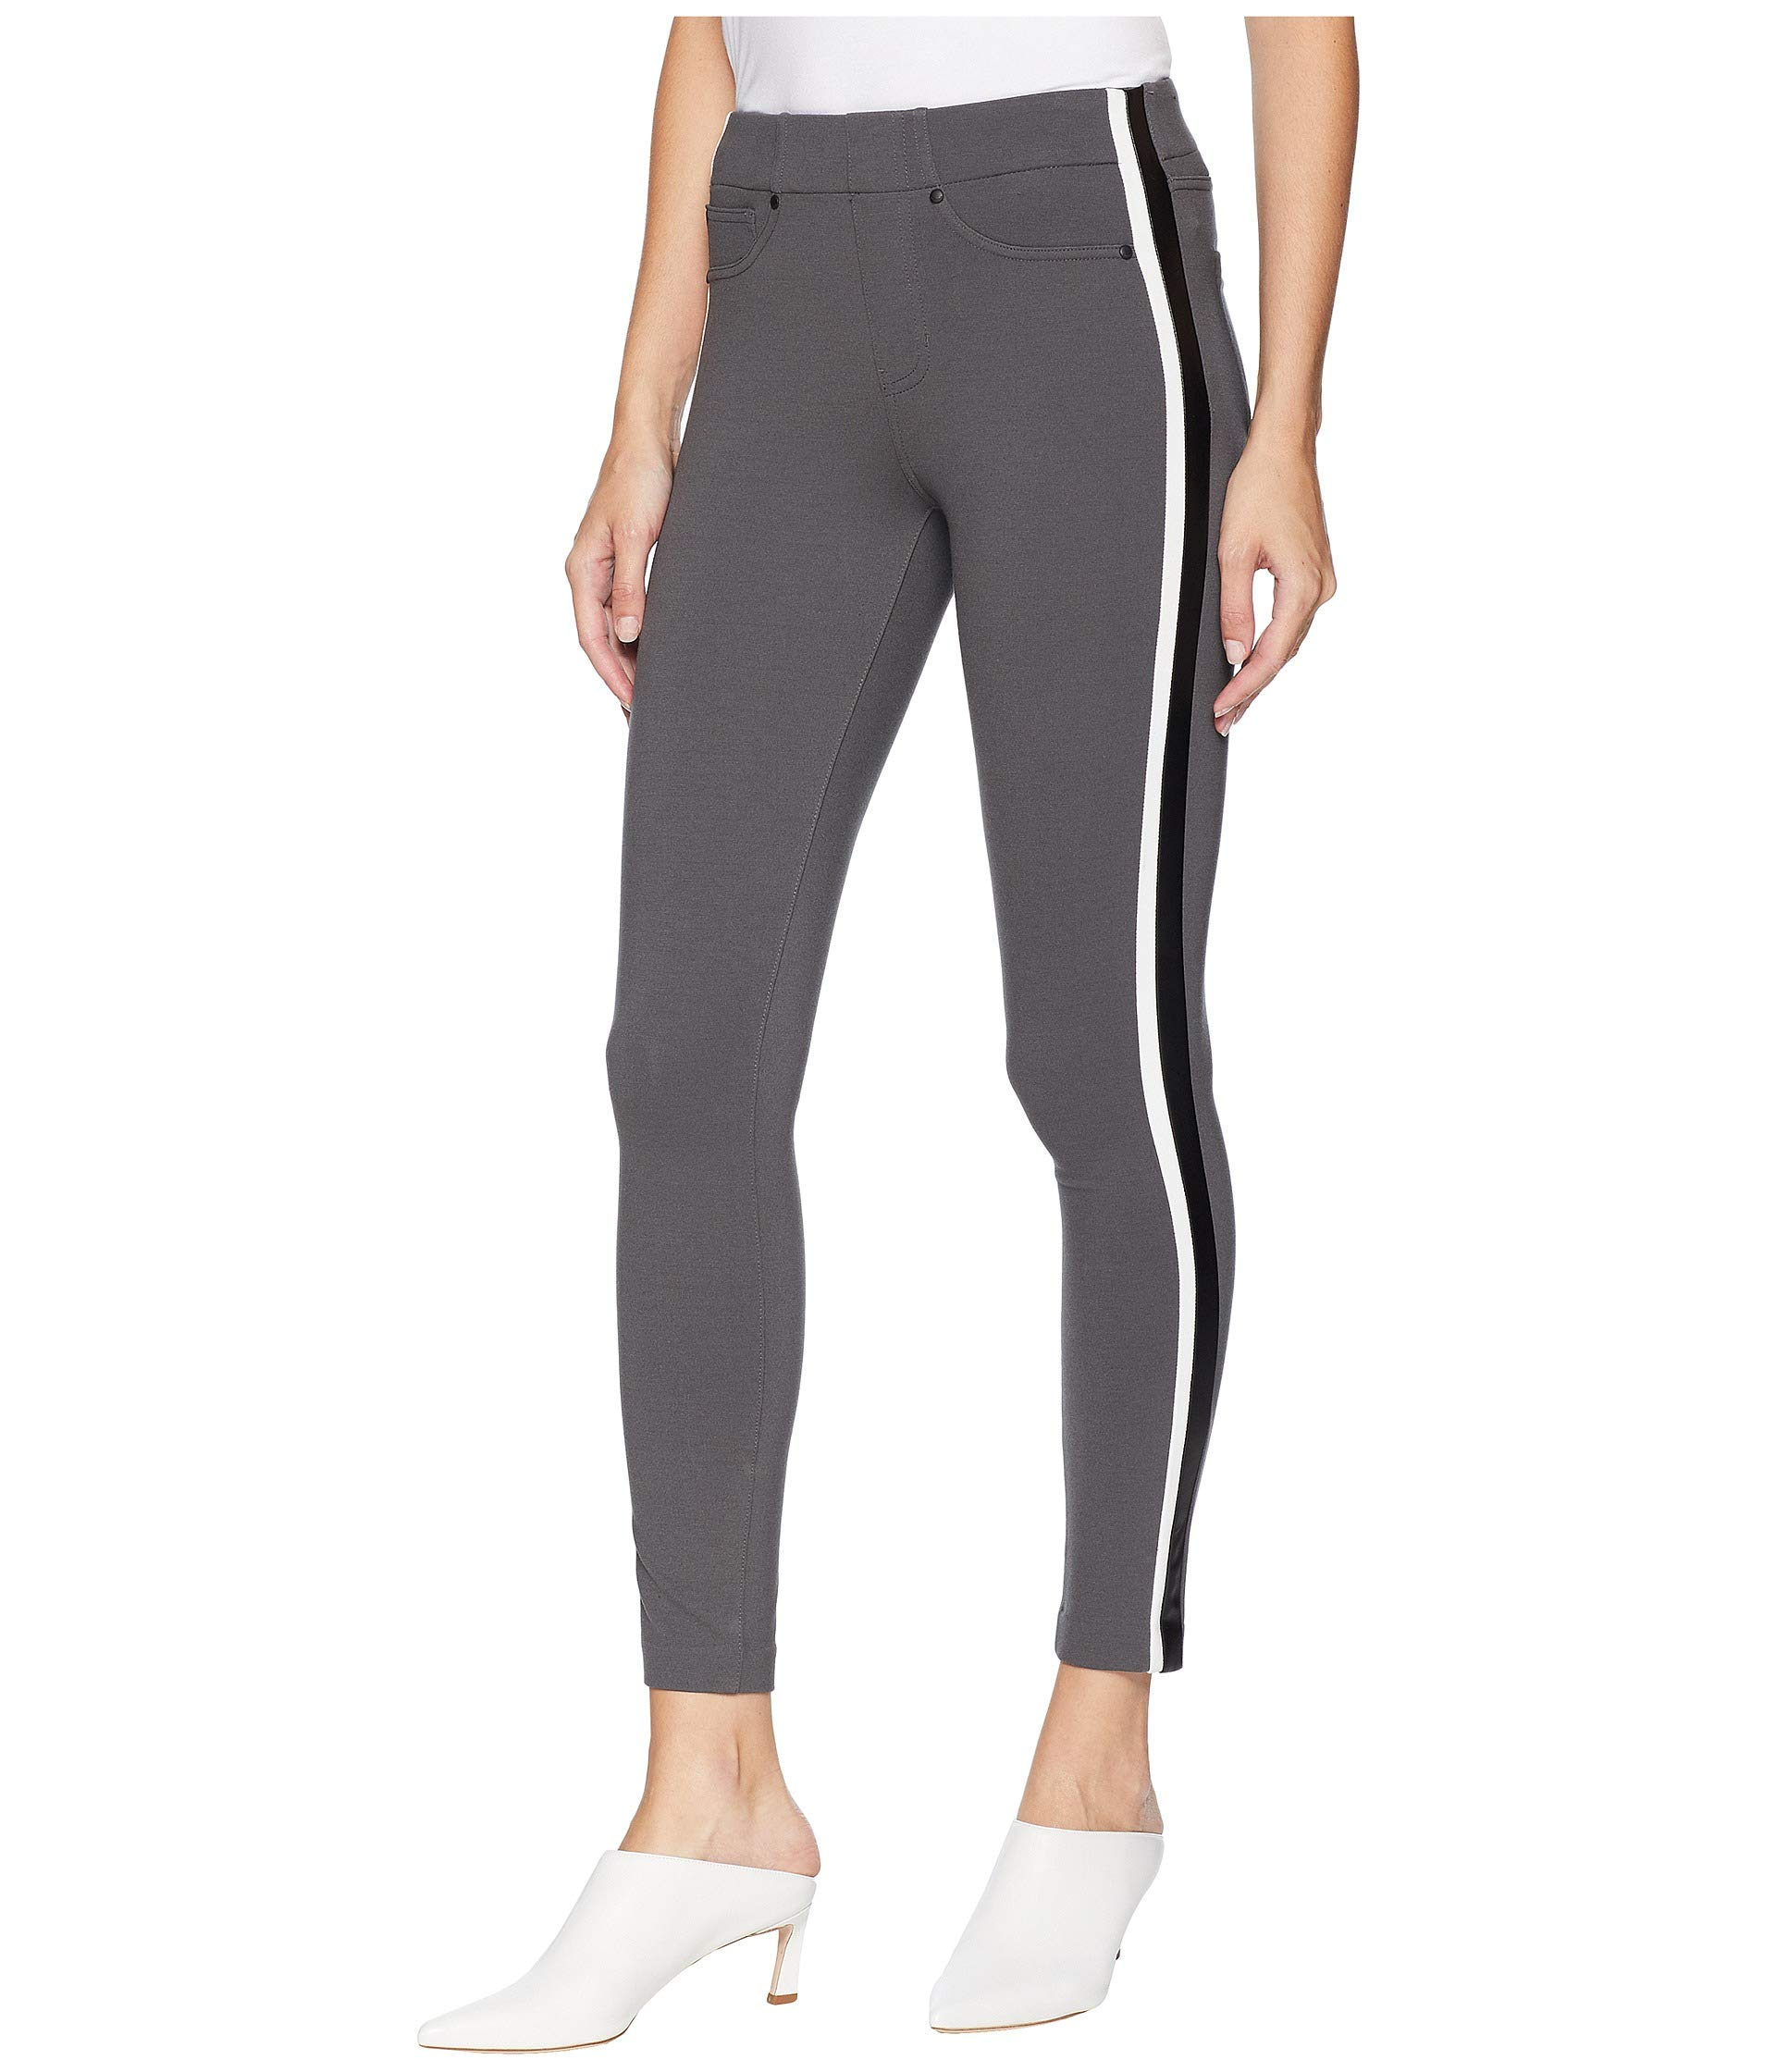 Black Egret Magnet In Double Leggings Knit Ponte Super Stripe Ankle Stretch Liverpool Chloe vR6X7PP